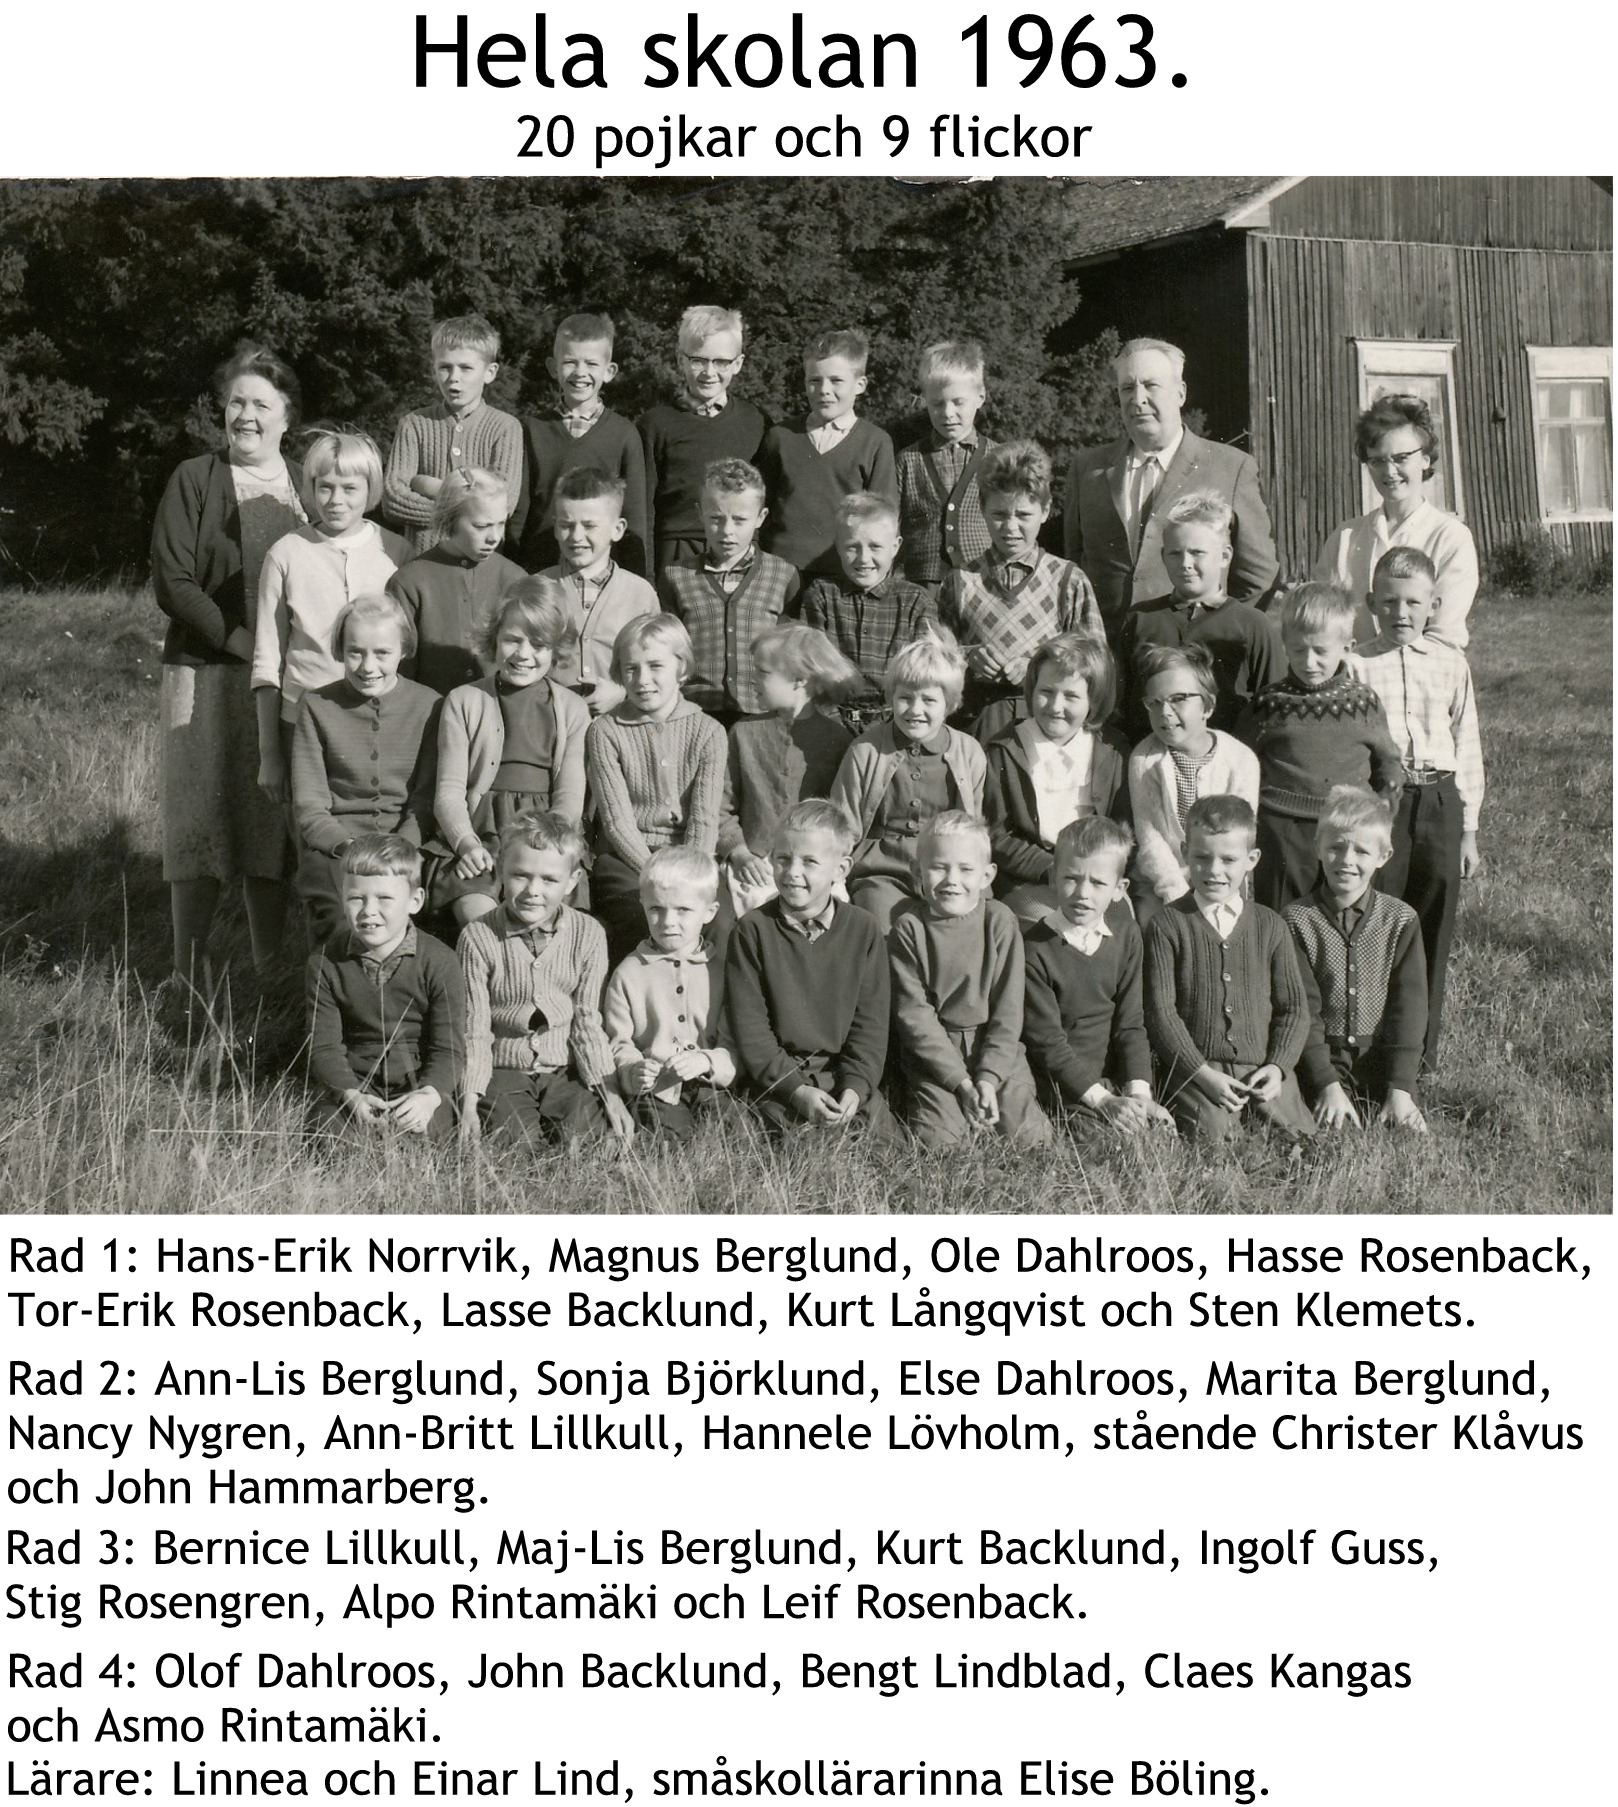 1963 Skolfoto